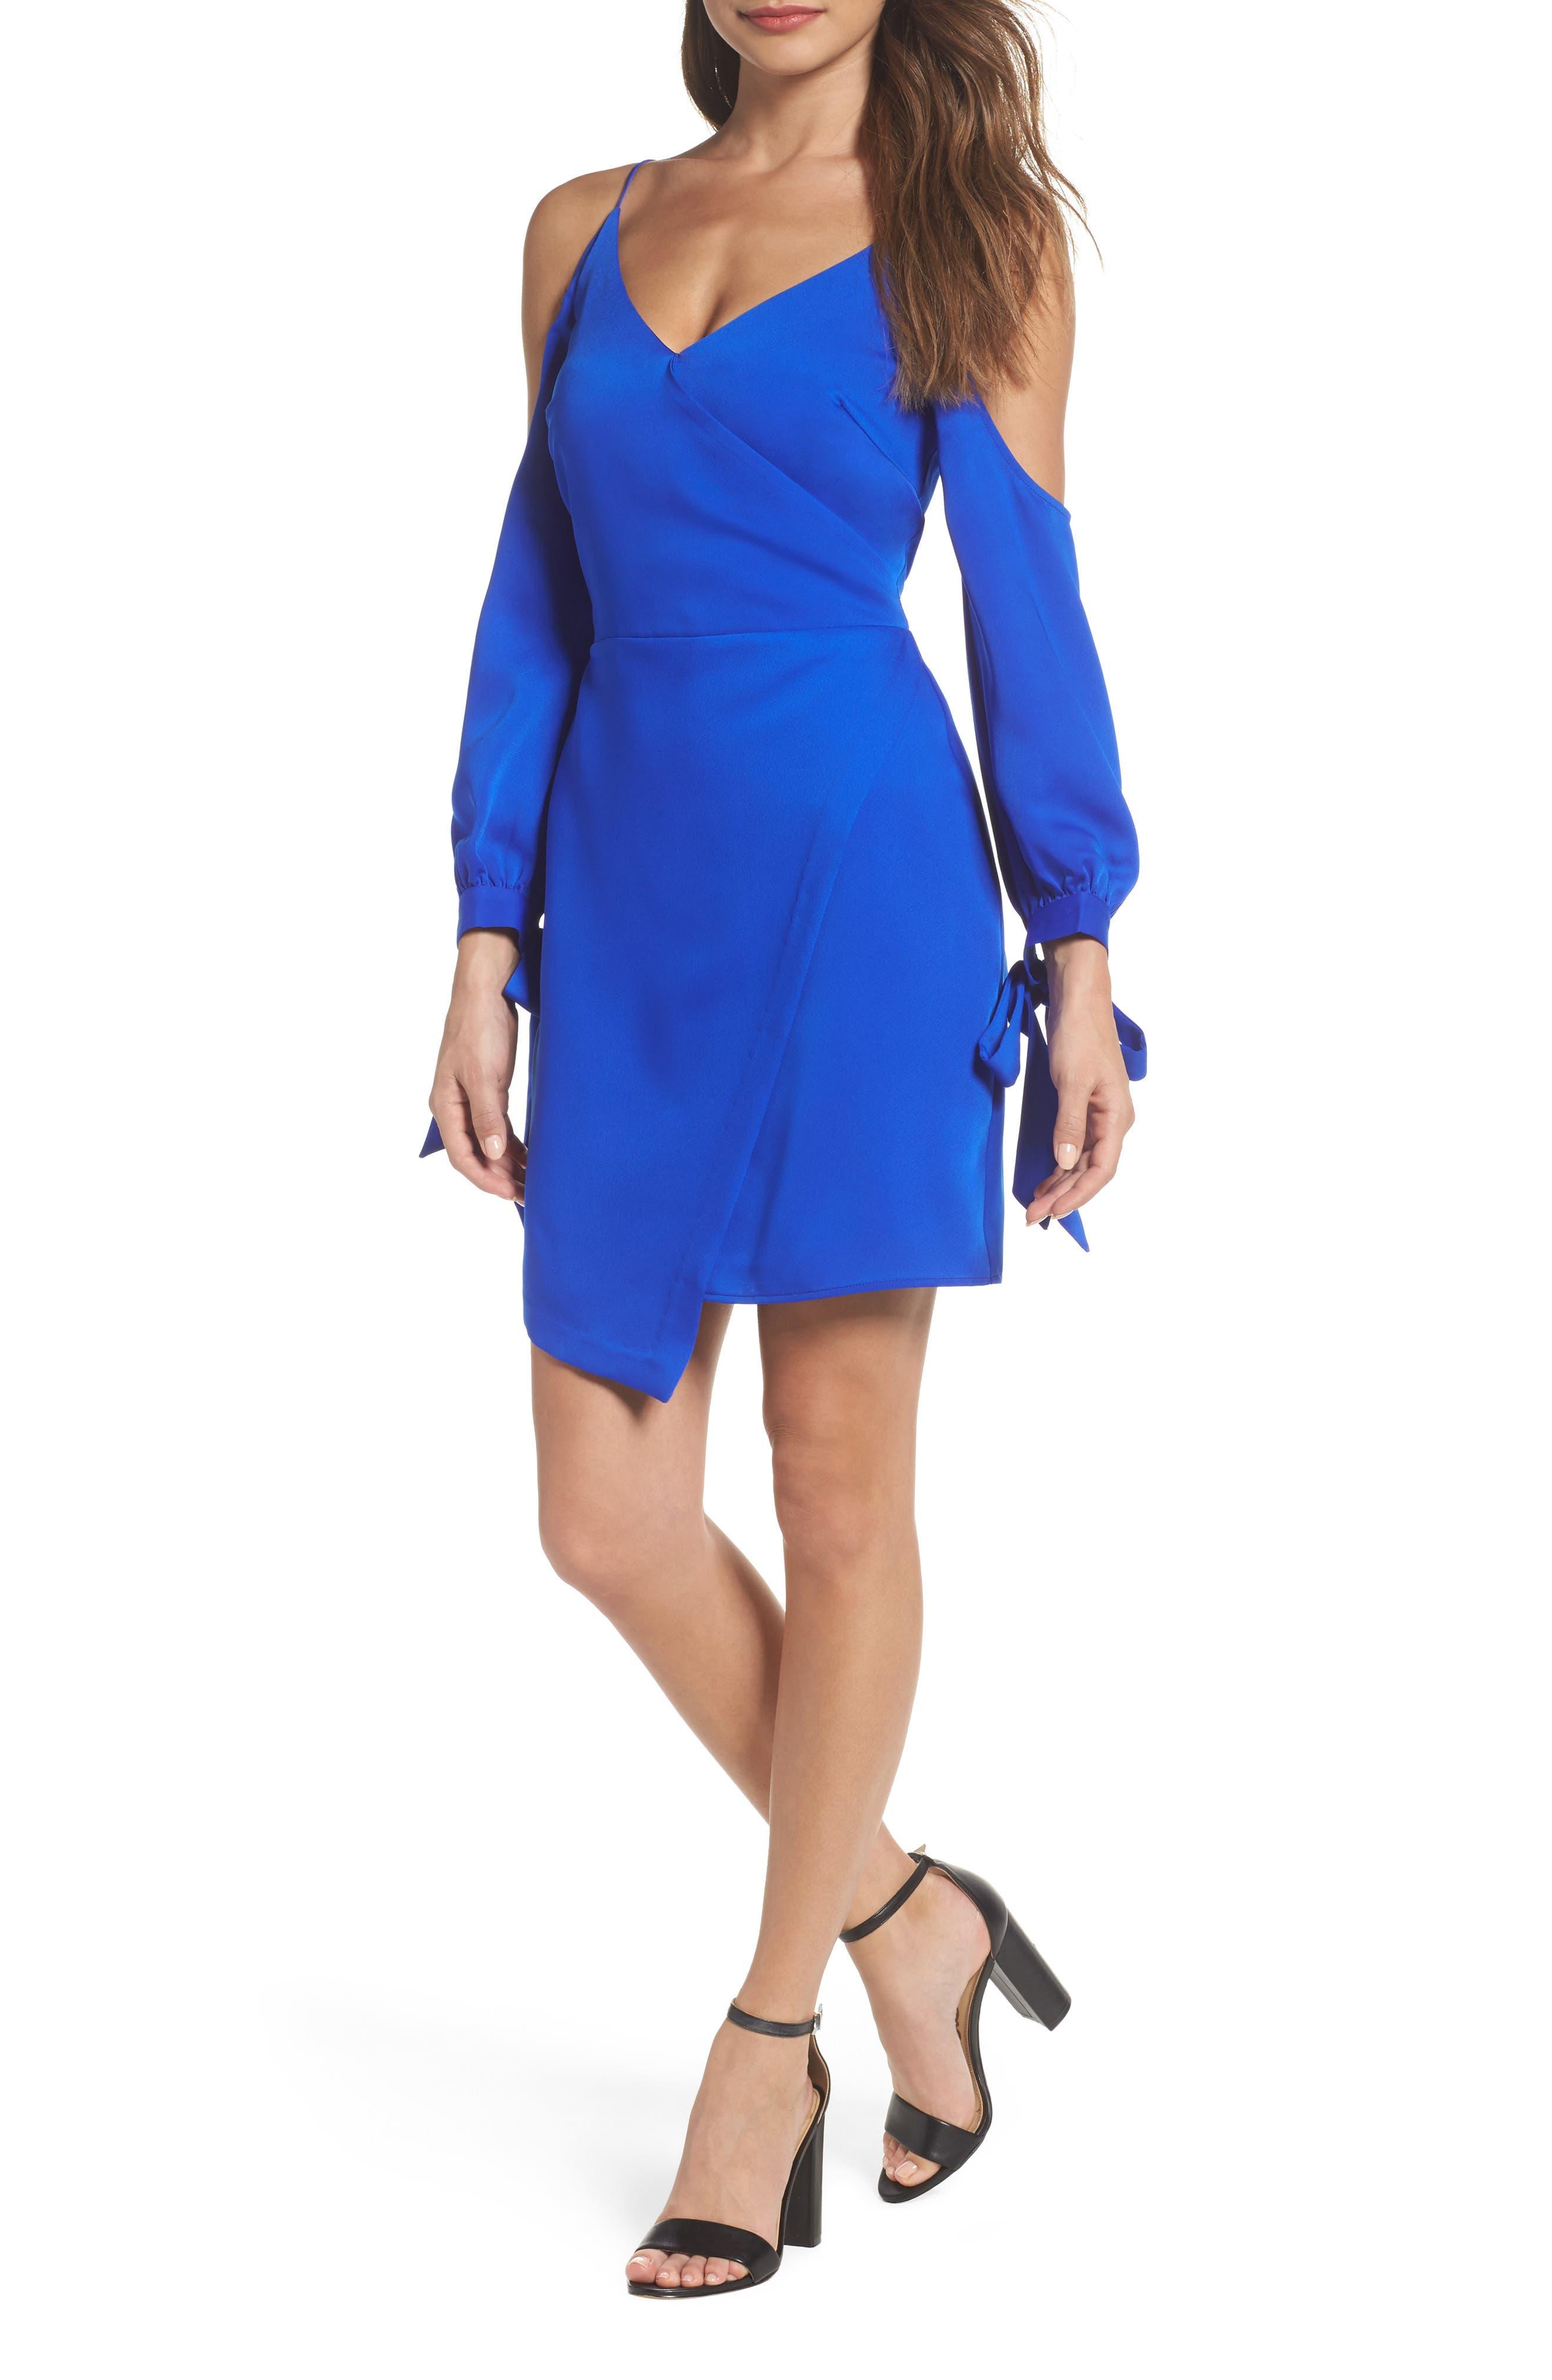 Alternate Image 1 Selected - Adelyn Rae Amelia Cold Shoulder Sheath Dress